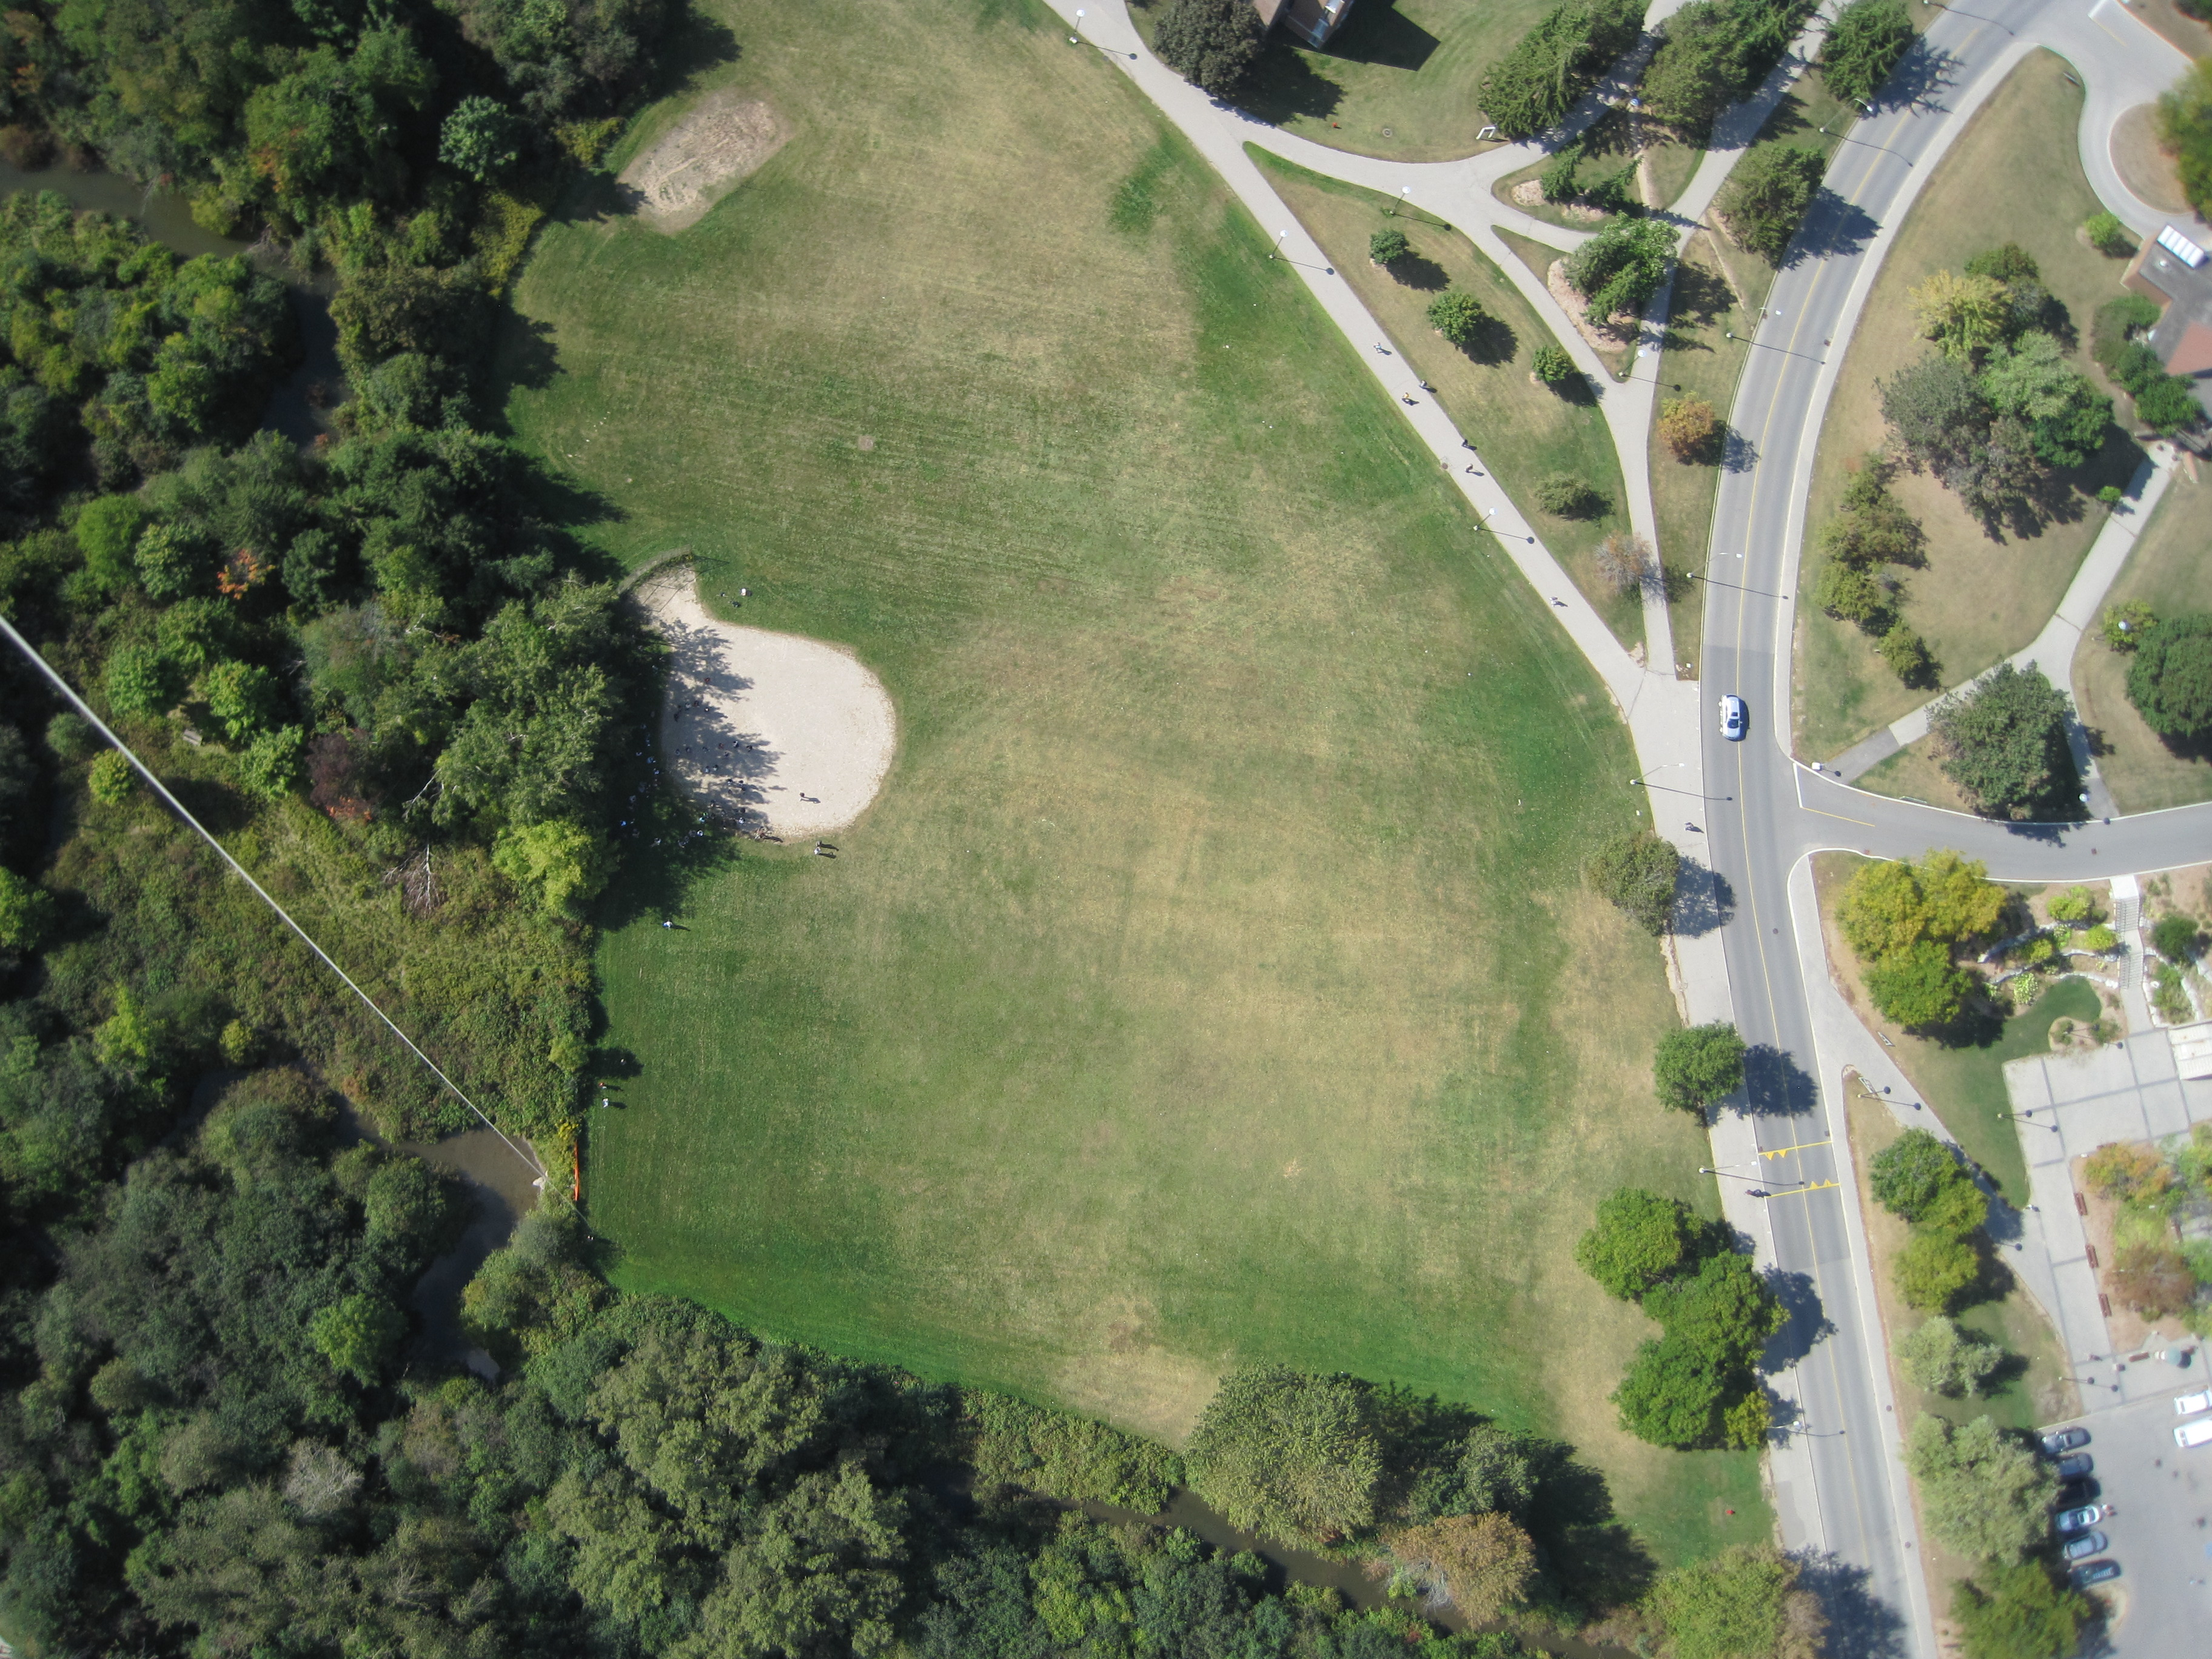 V1 Green Aerial Imagery